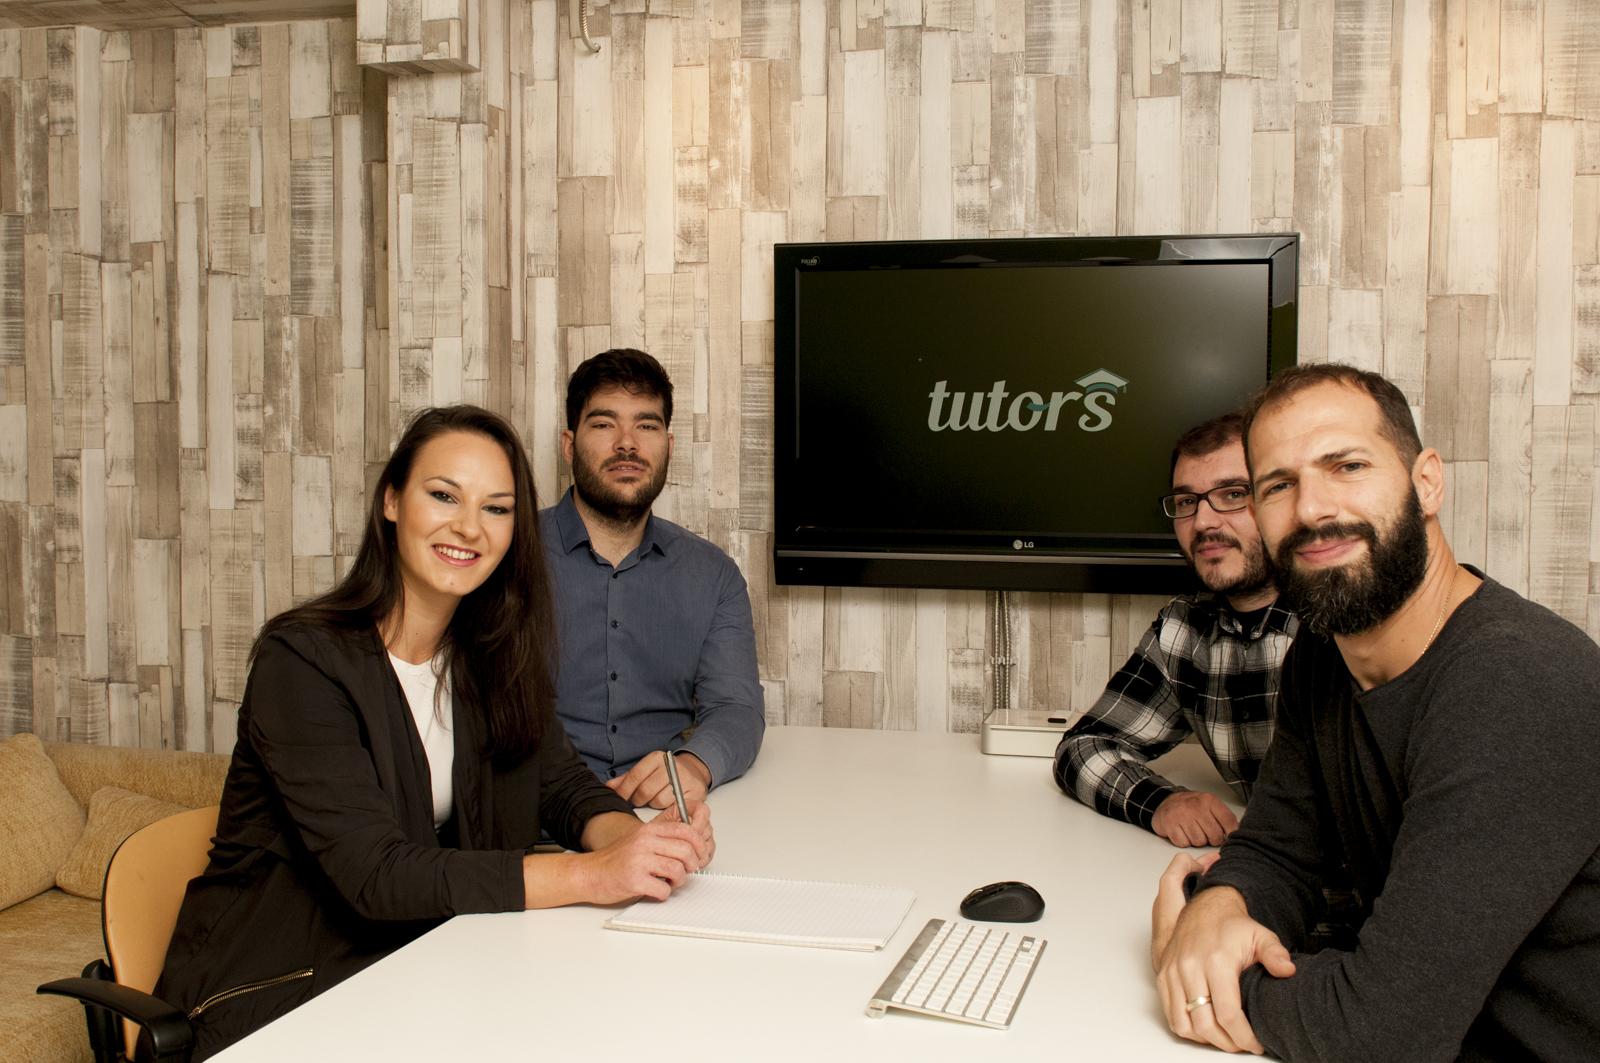 tutors.gr